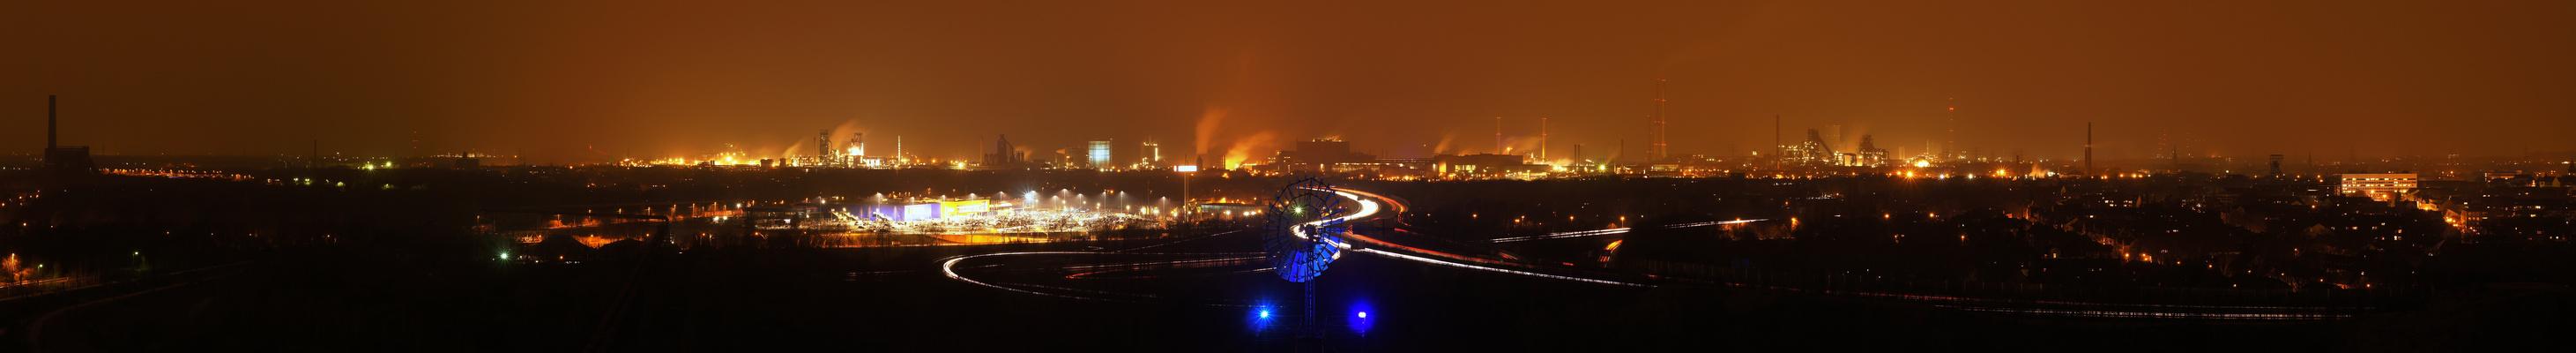 Duisburg Panorama